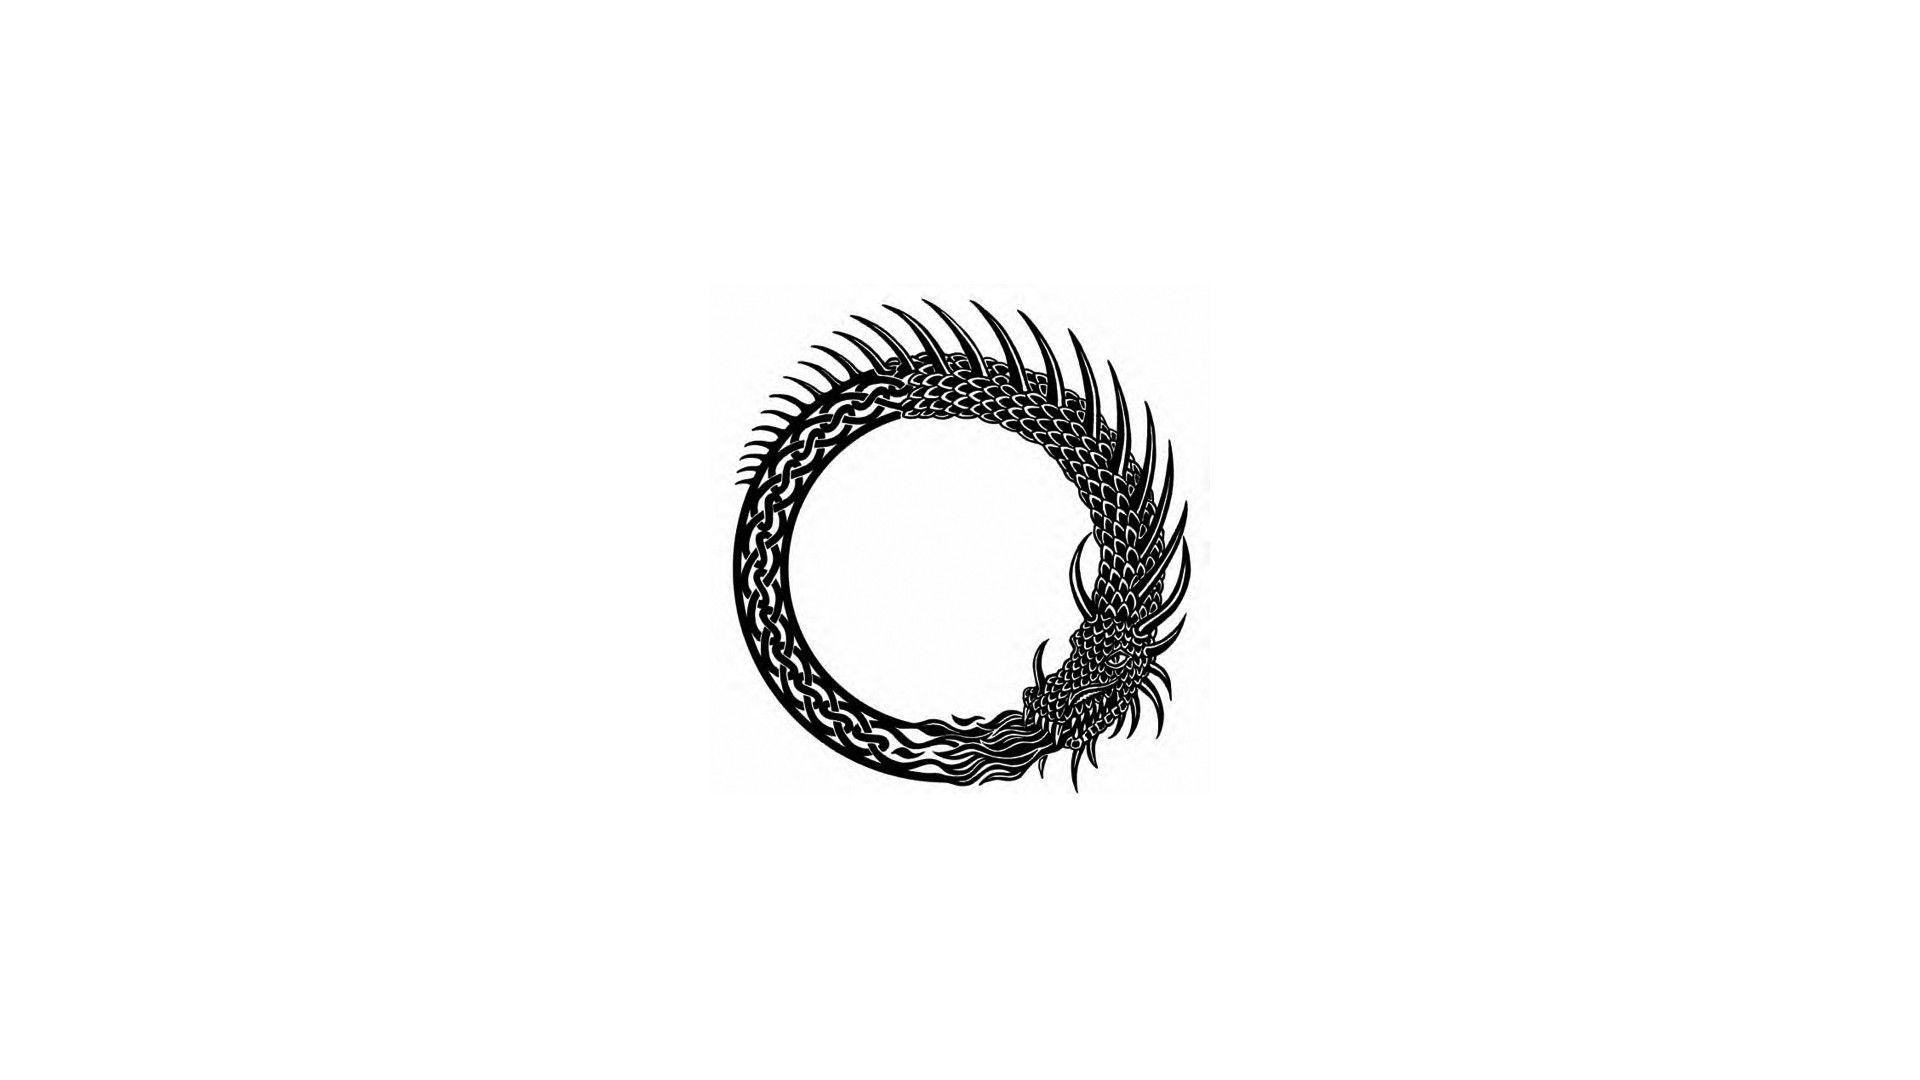 Minimalism Simple Background Dragon Ouroboros Wallpaper Ouroboros Simple Backgrounds Phoenix Tattoo Design